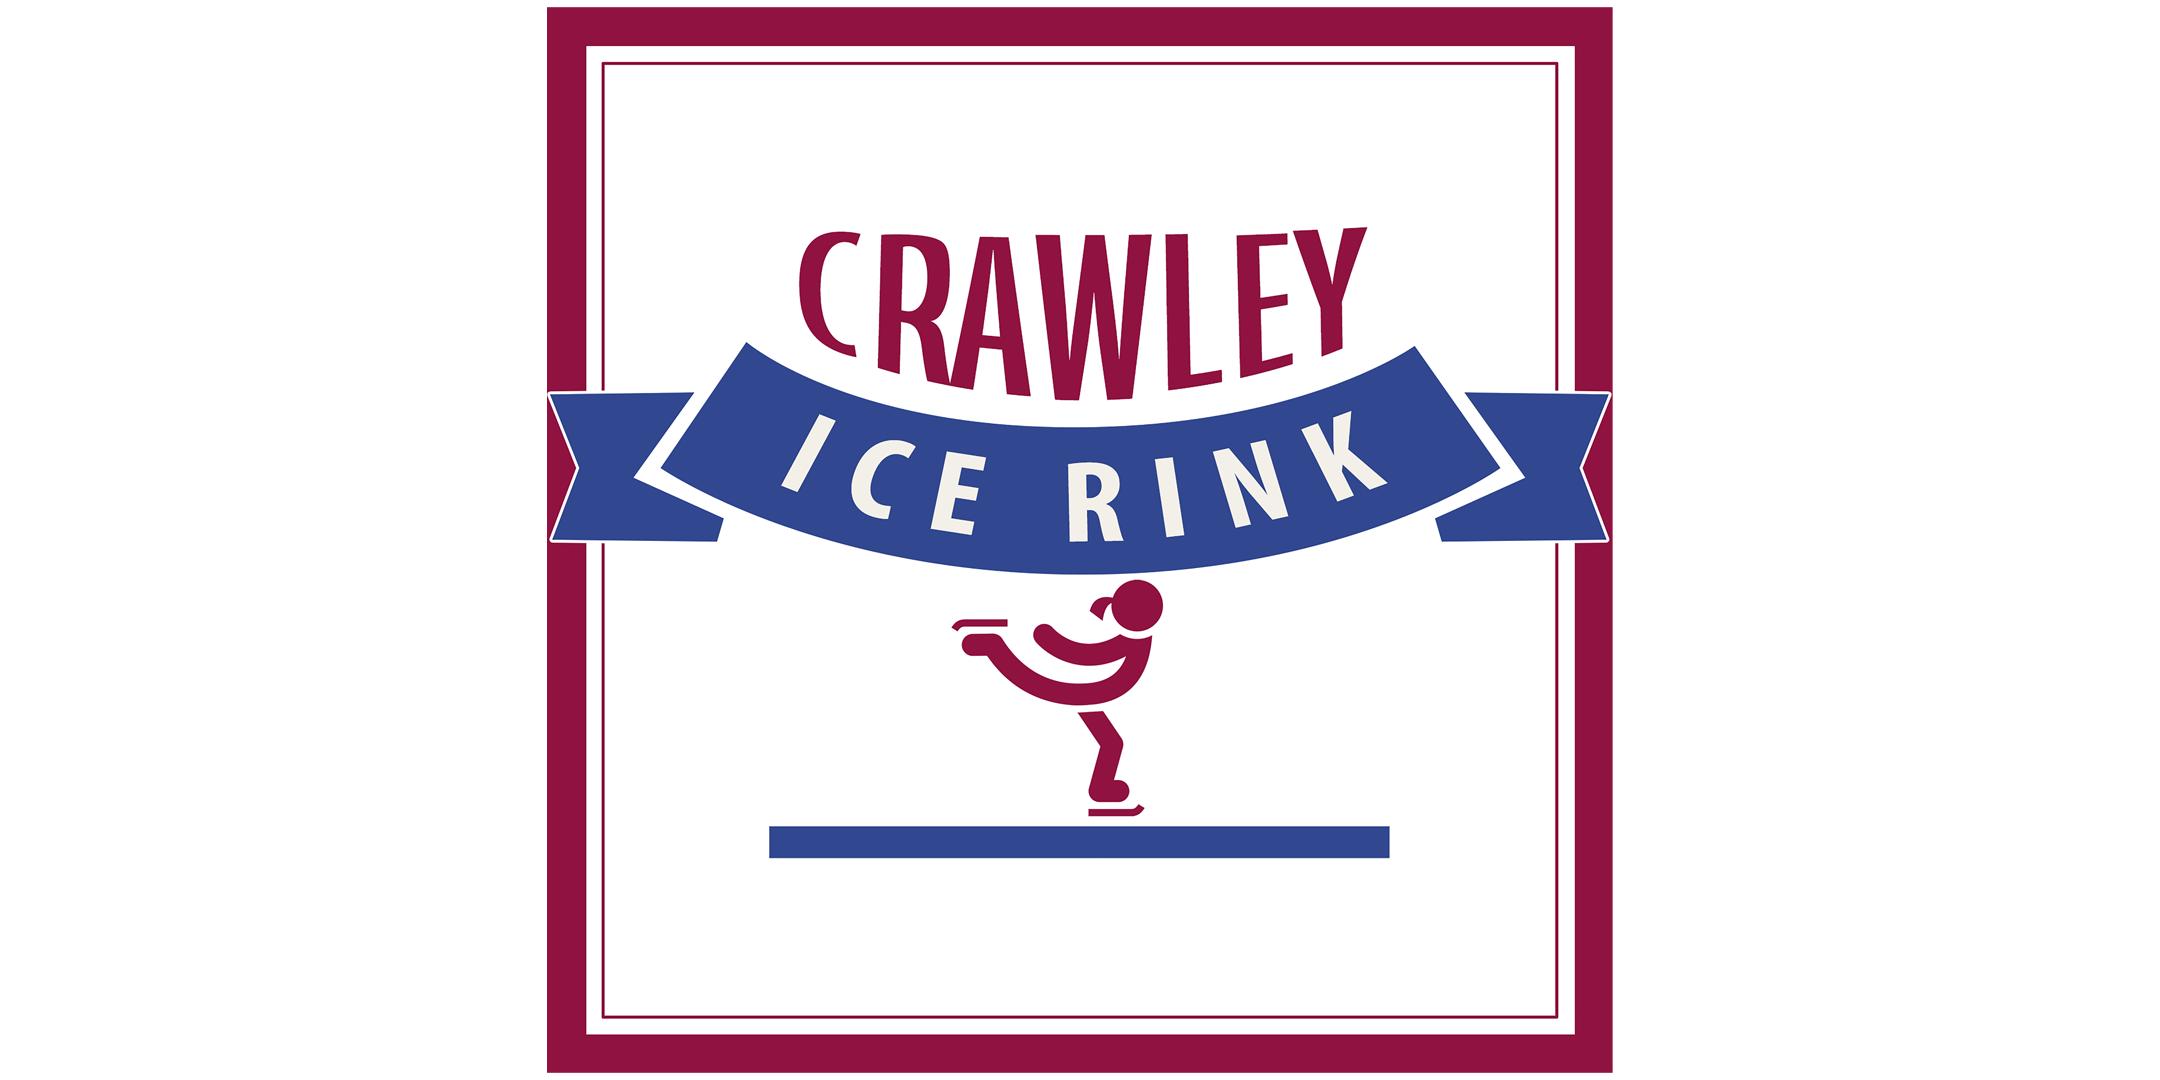 Crawley Ice Rink - 15th December (Off Peak)